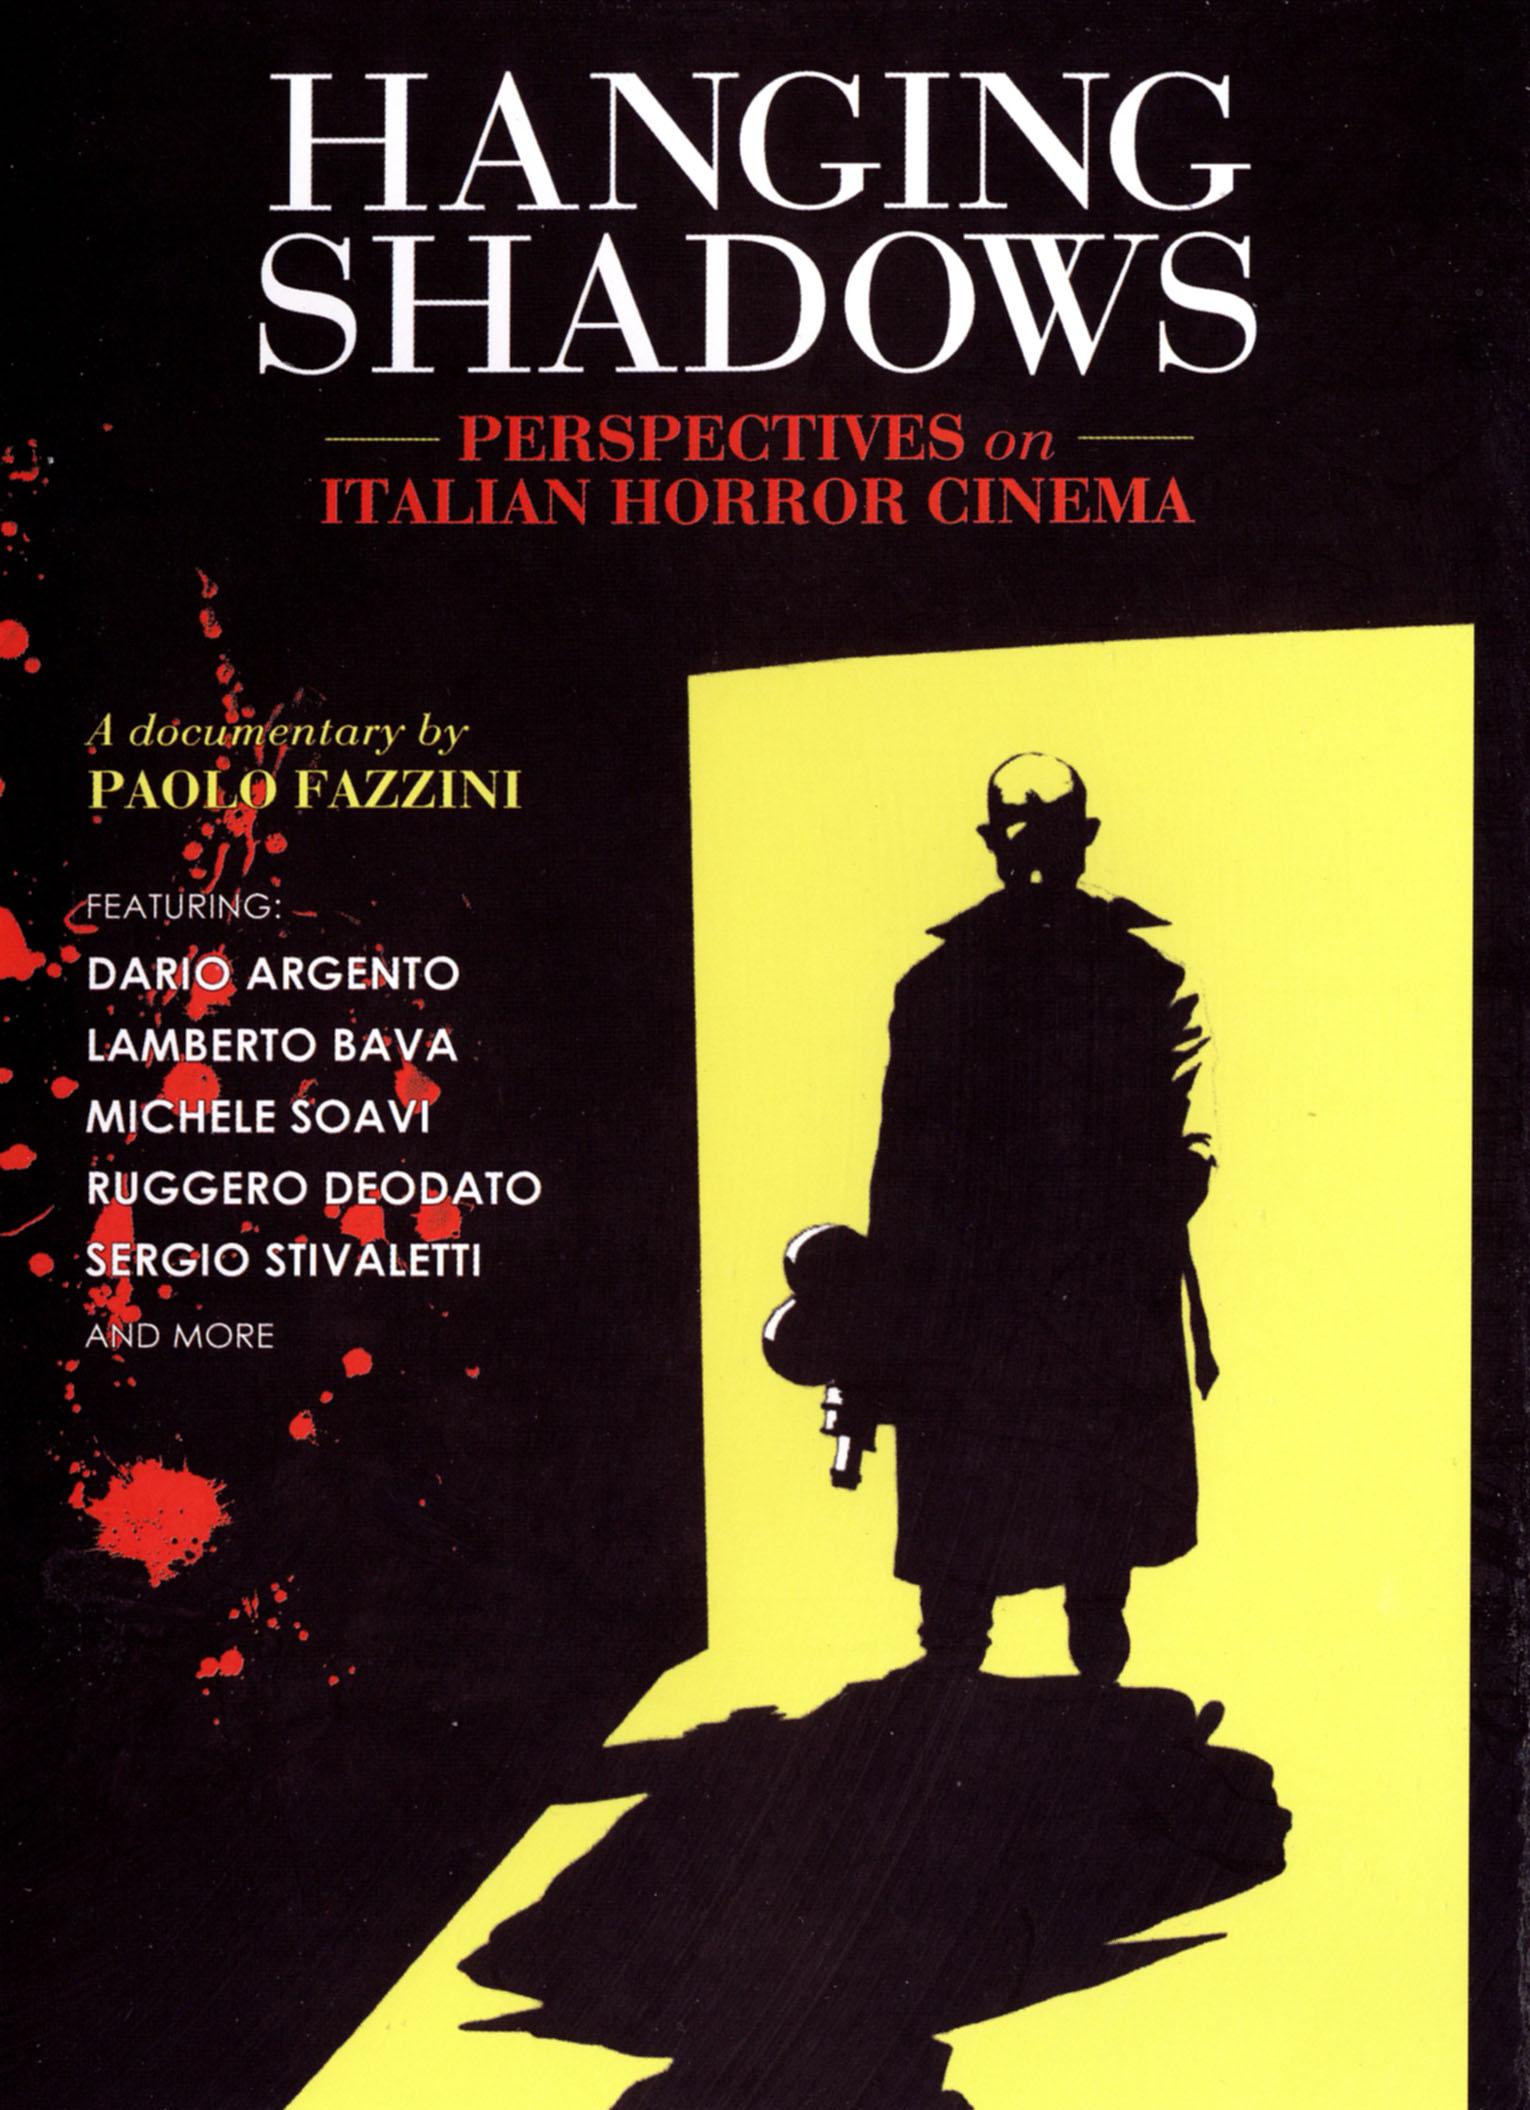 Hanging Shadows: Perspectives on Italian Horror Cinema